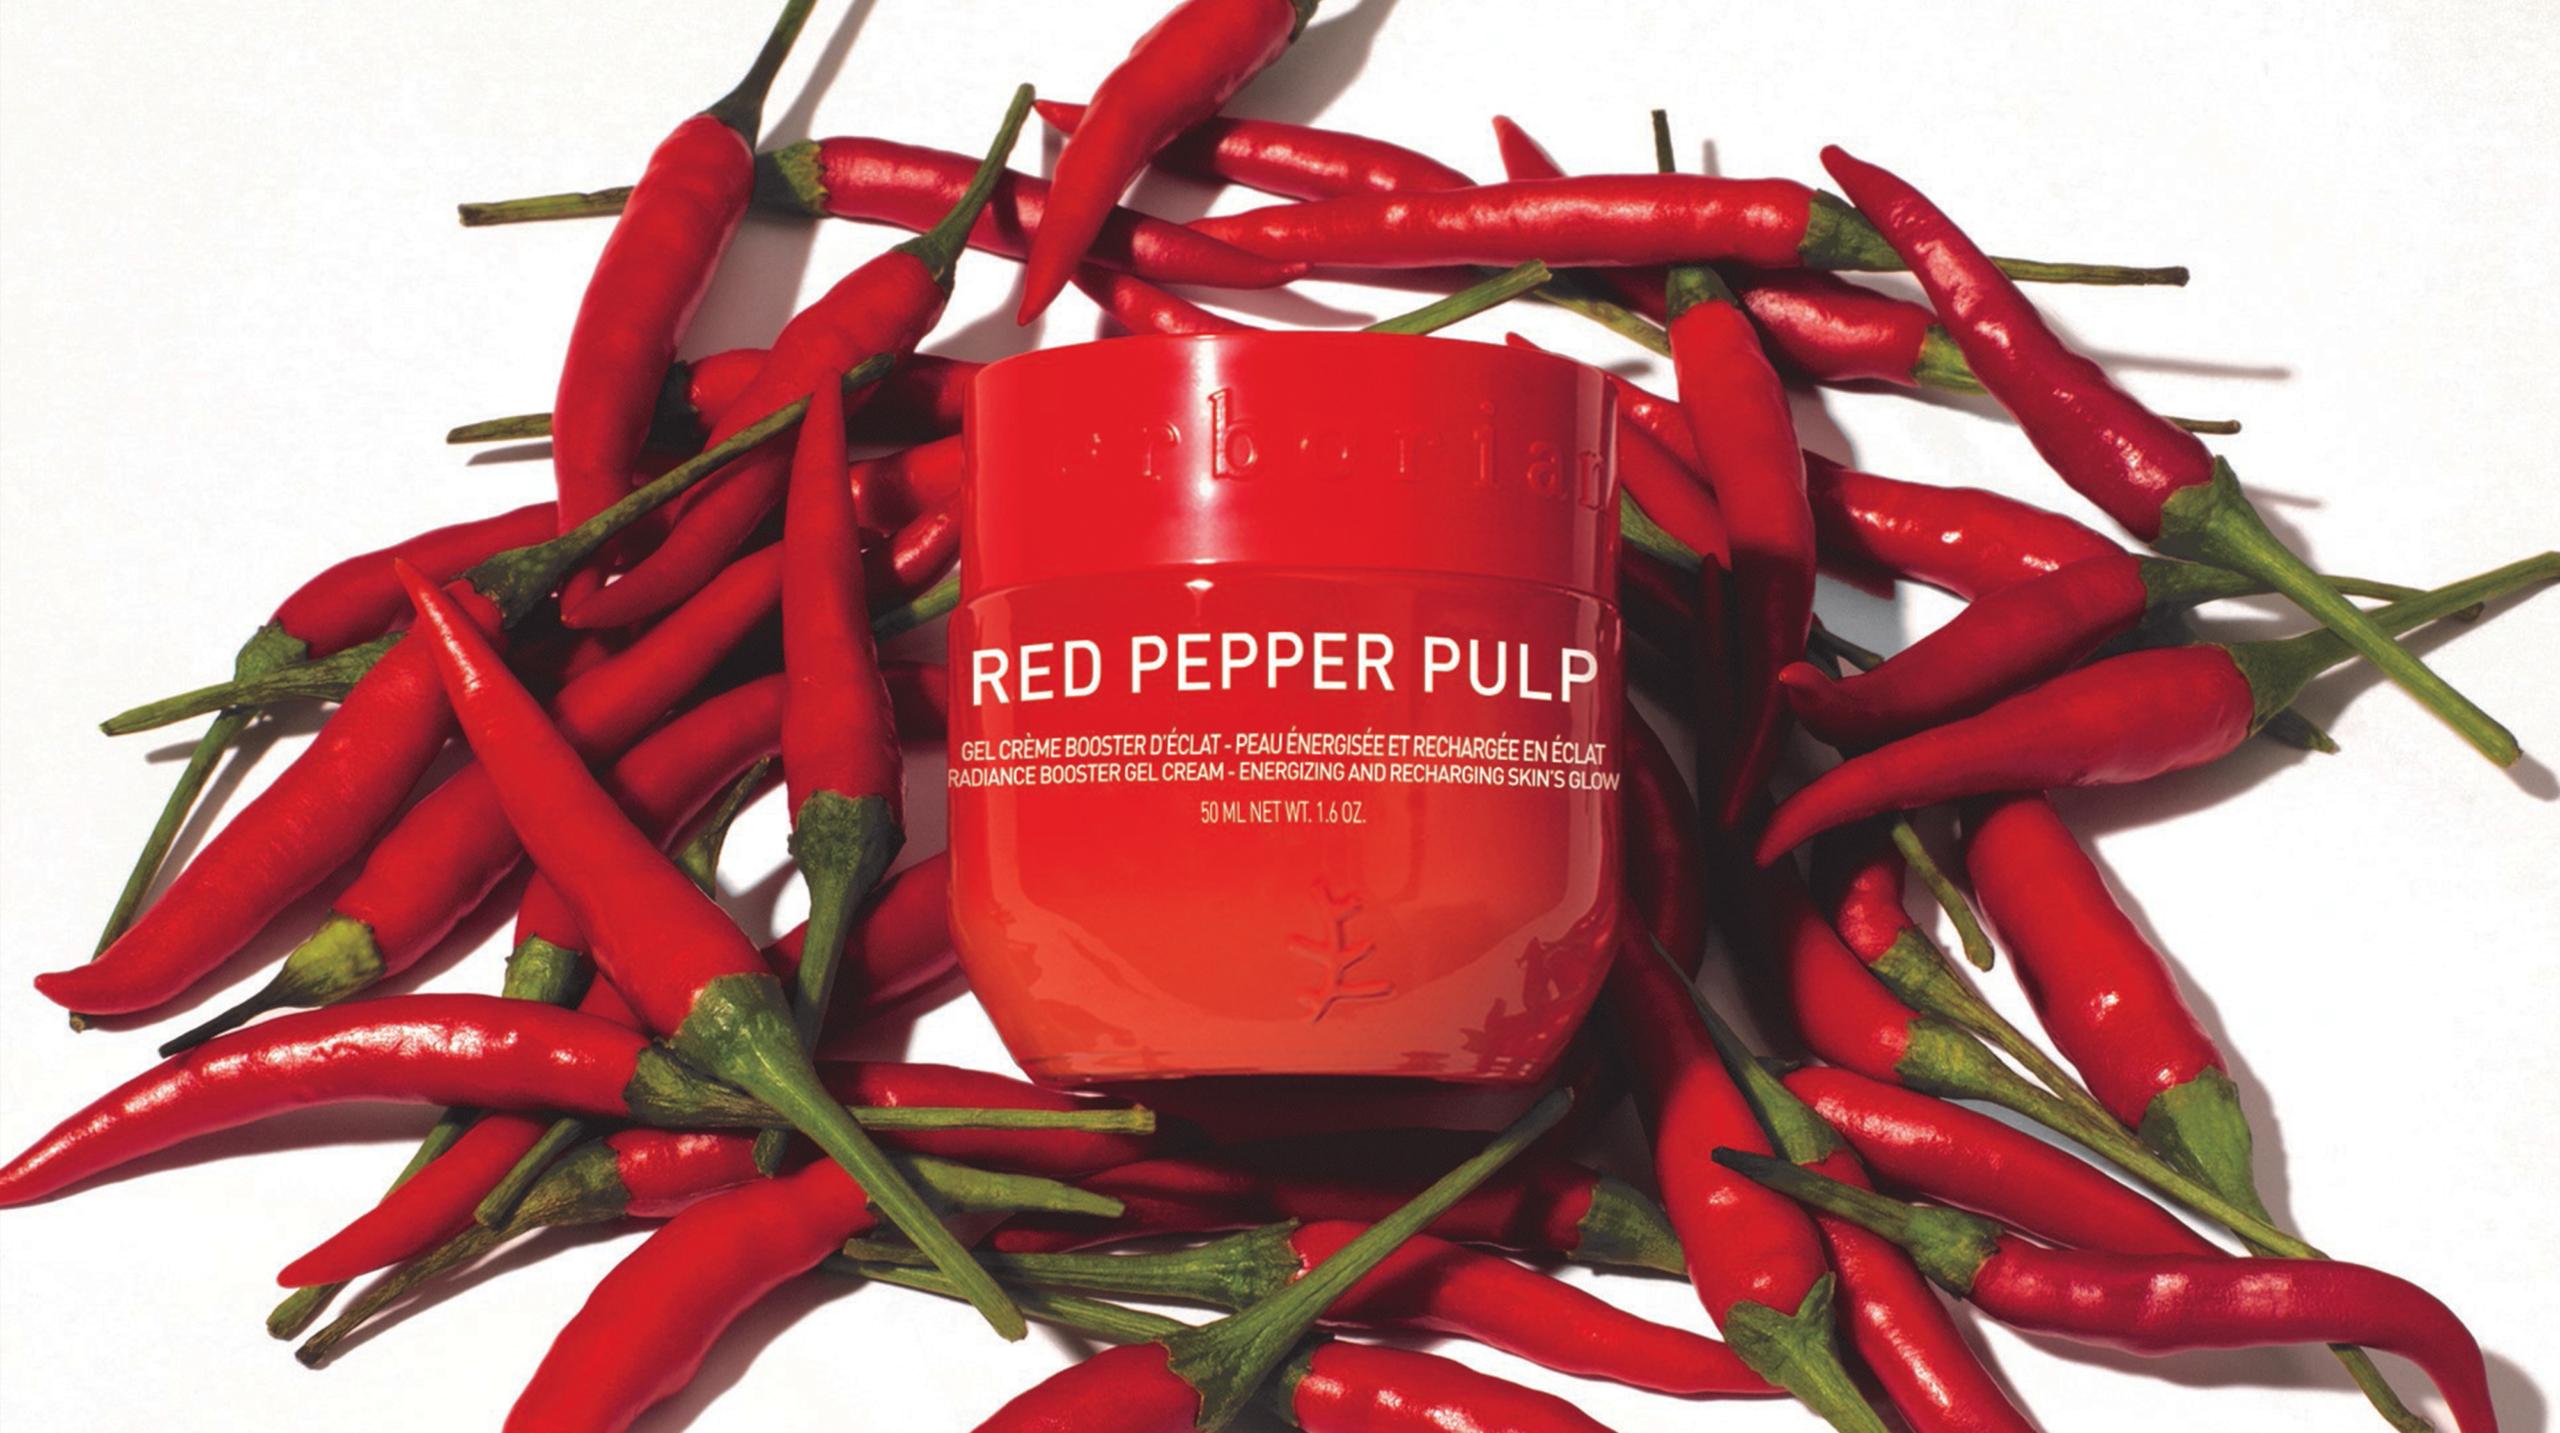 erborian-red-pepper-soins-coreens-au-piment-avis-revue-blog